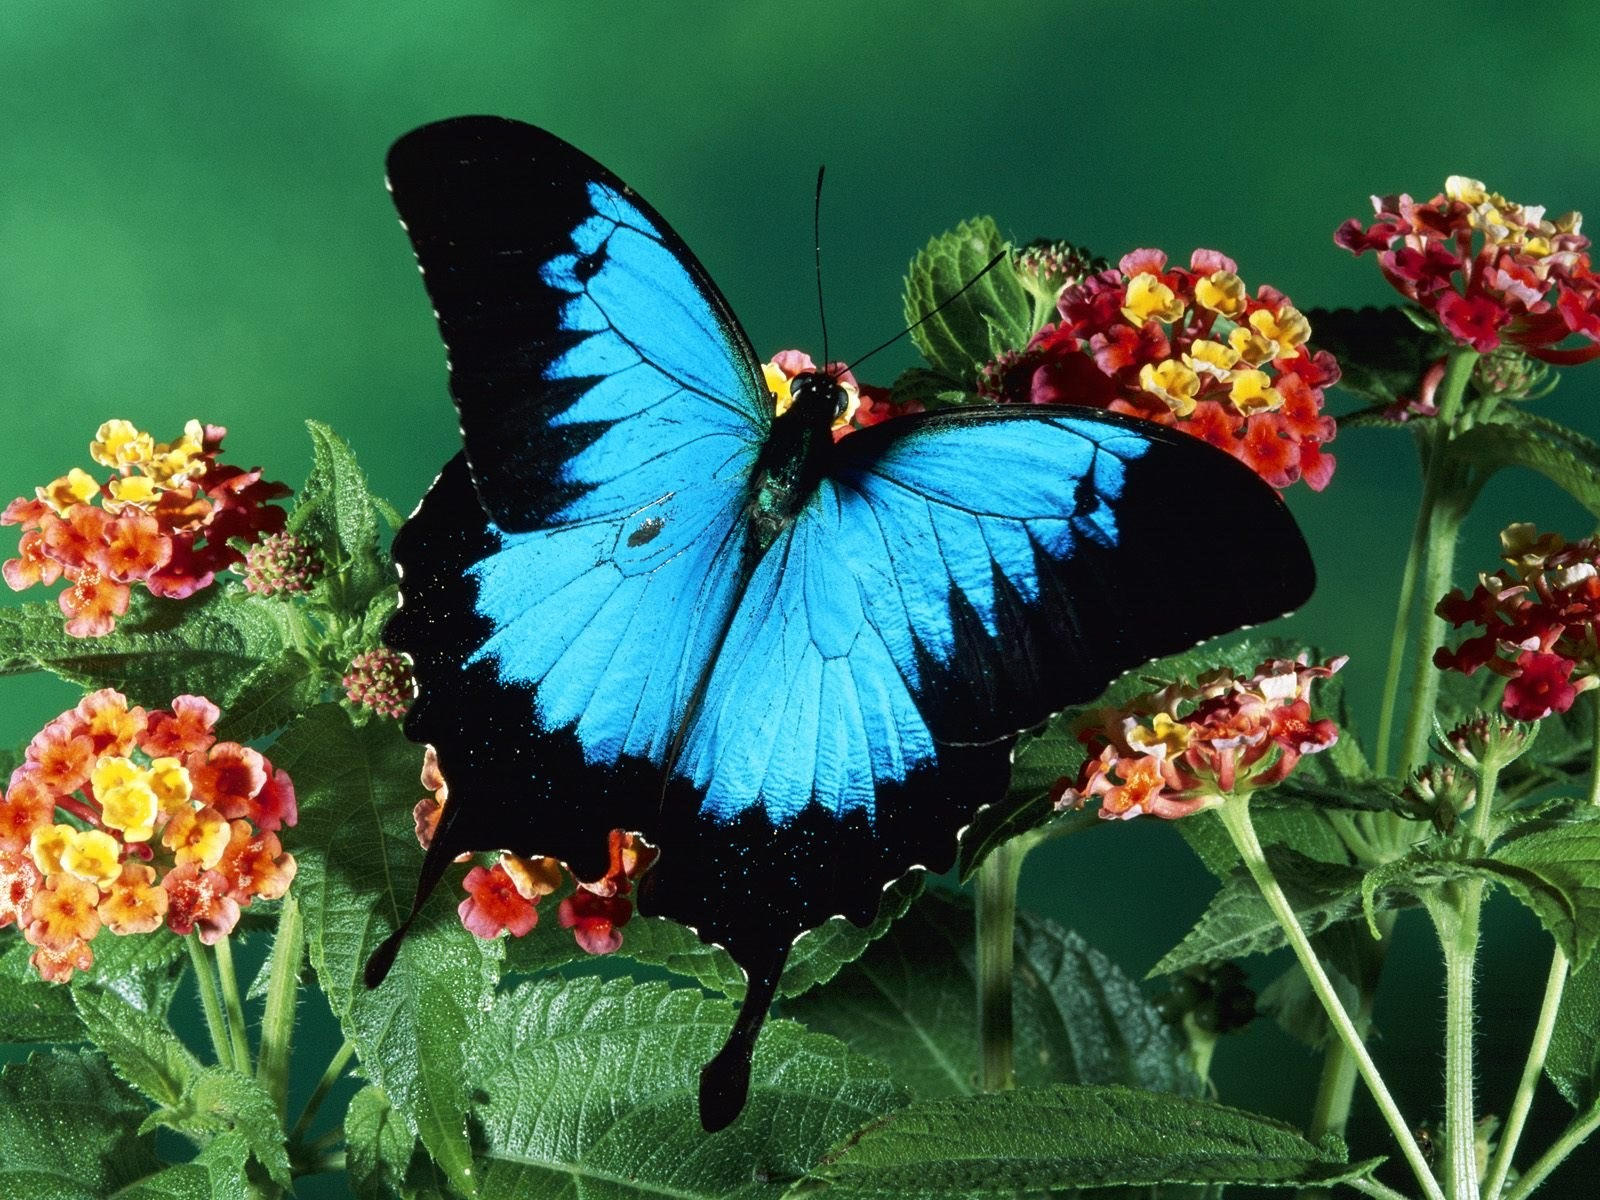 Бабочка черно-голубого окраса